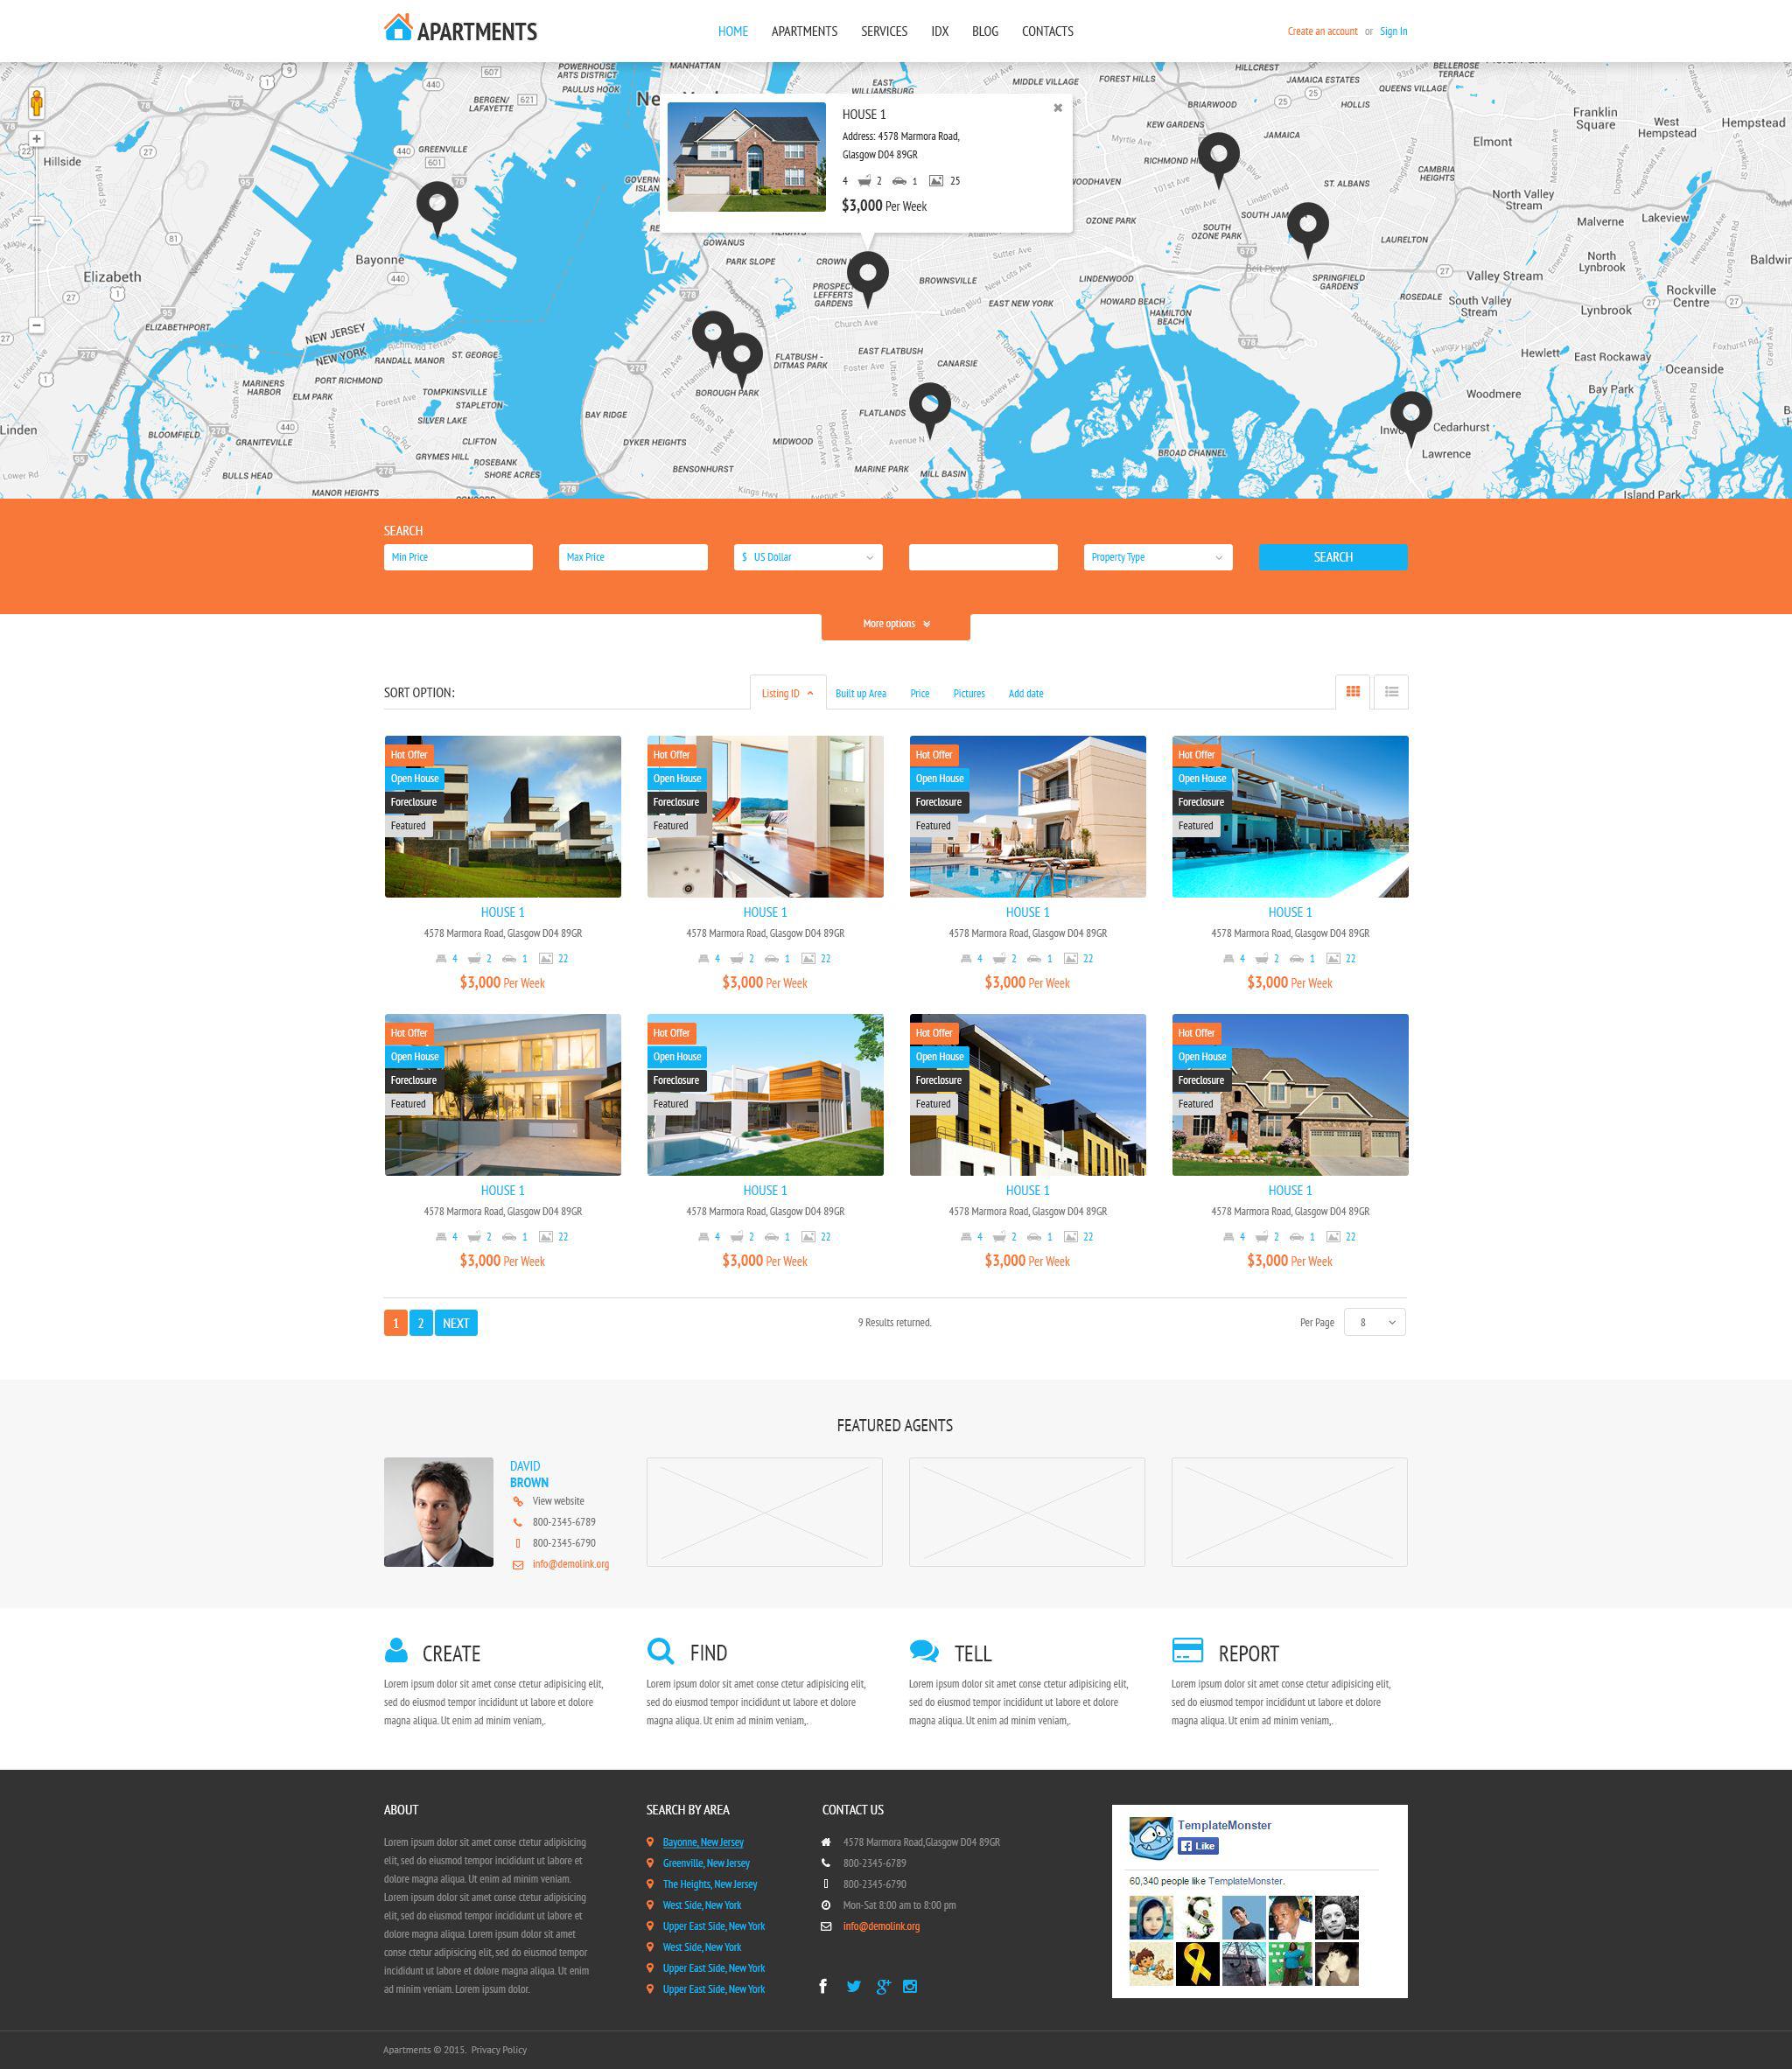 Apartments Rent Agency №53995 - скриншот